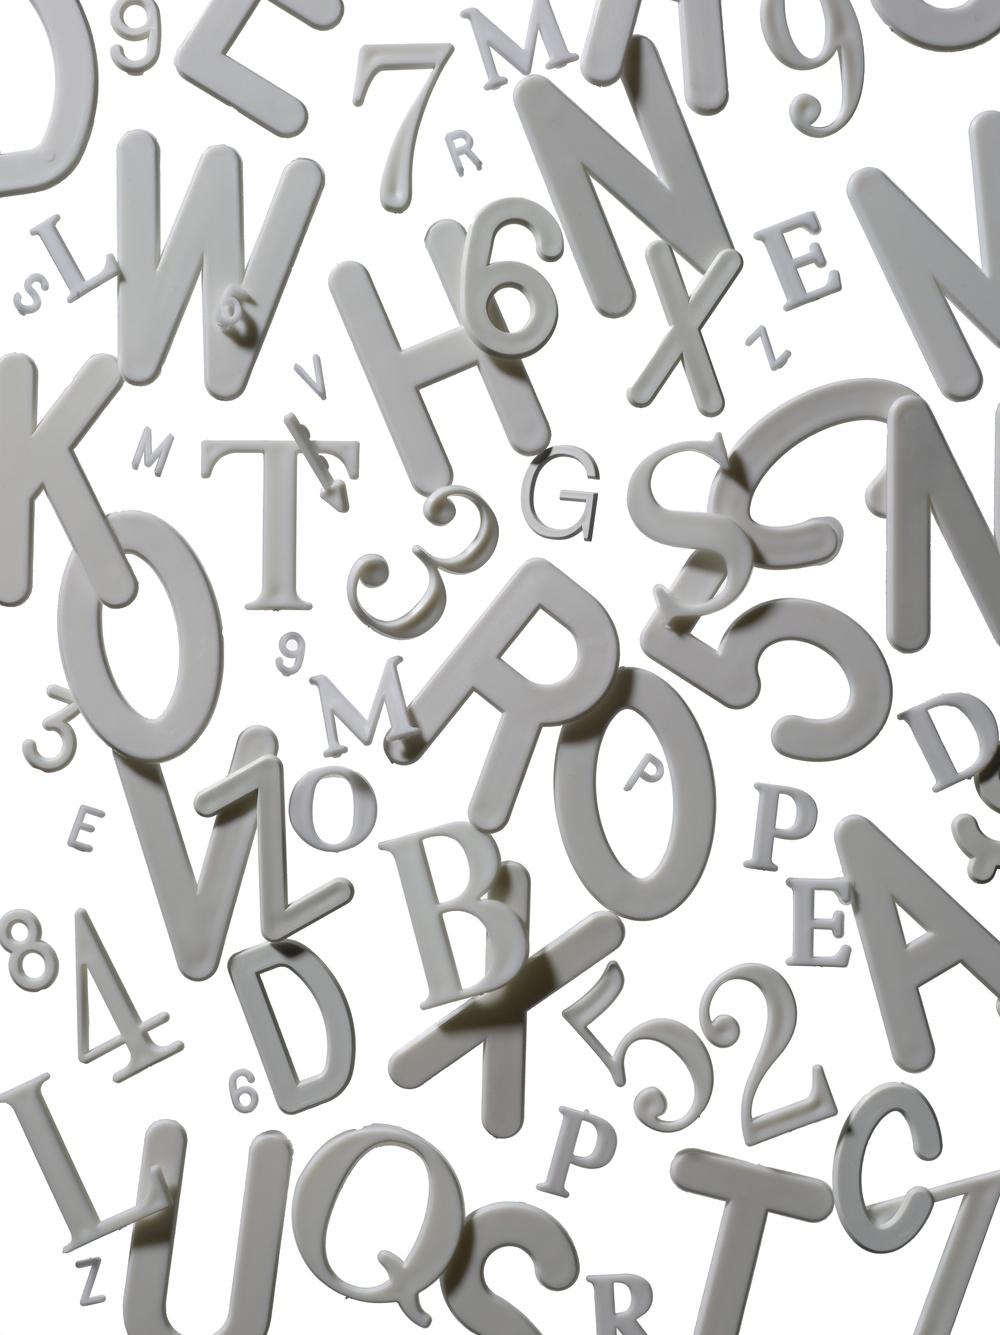 letter_scramble_1 (1).jpg